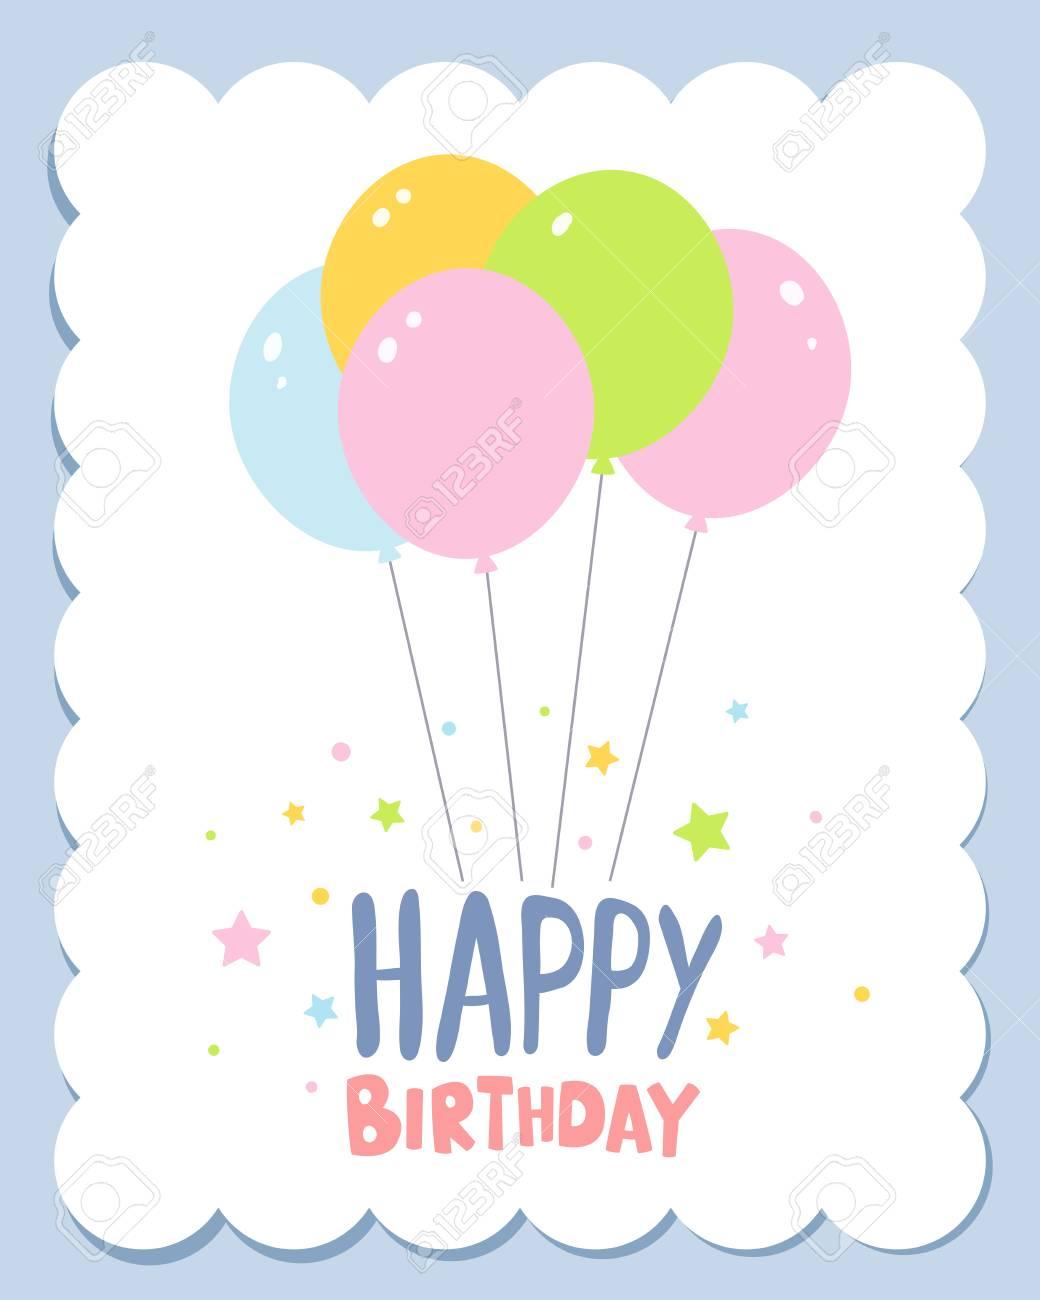 free happy birthday template